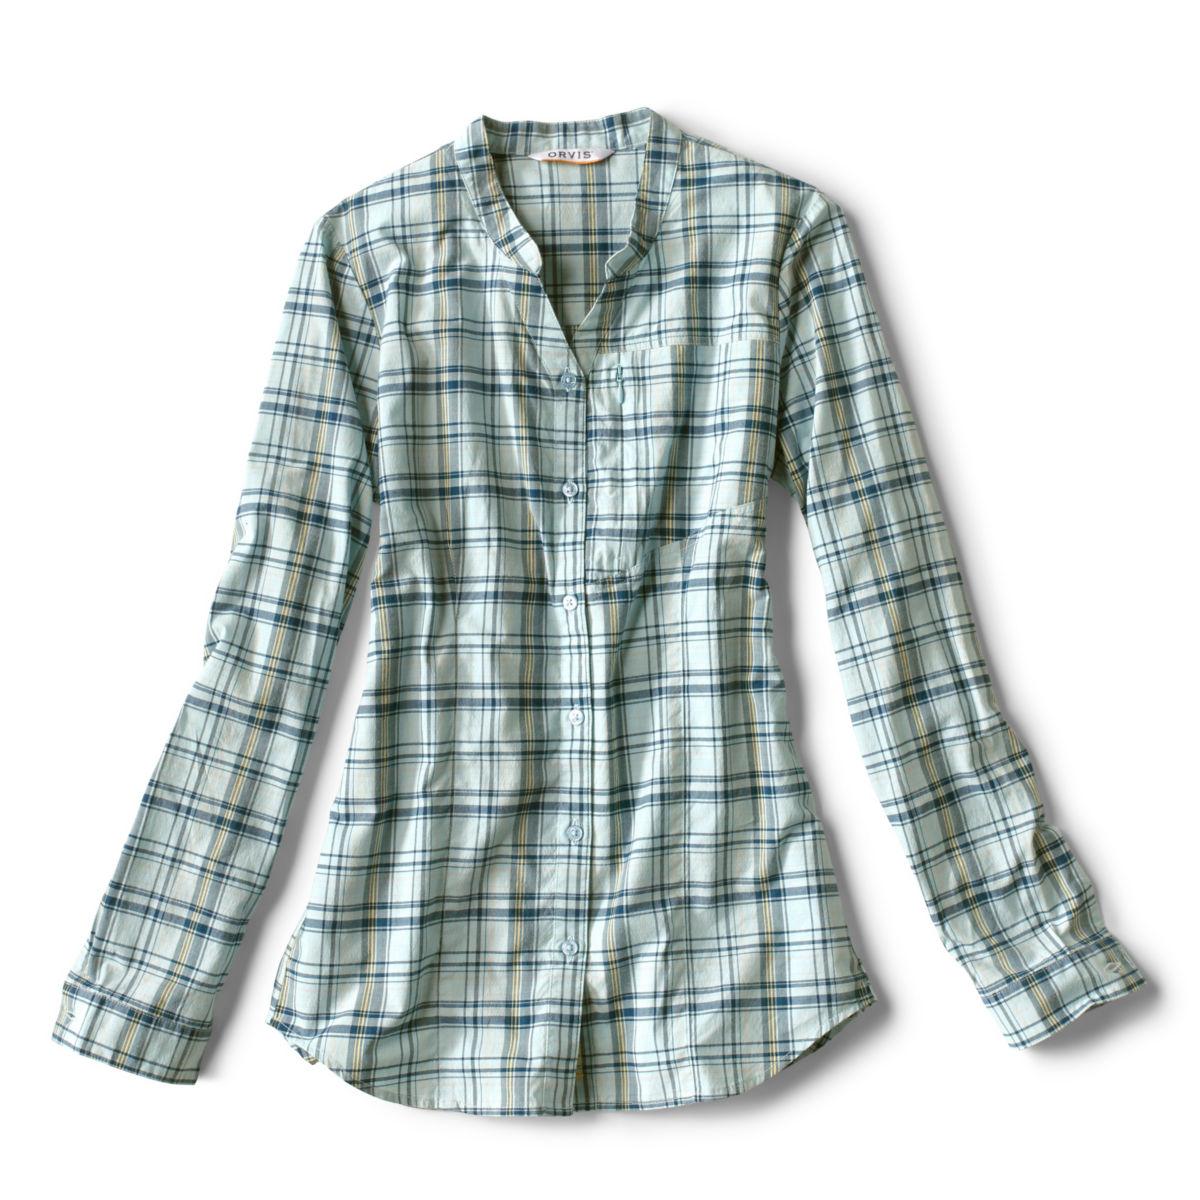 Ibis Long-Sleeved Shirt - image number 0